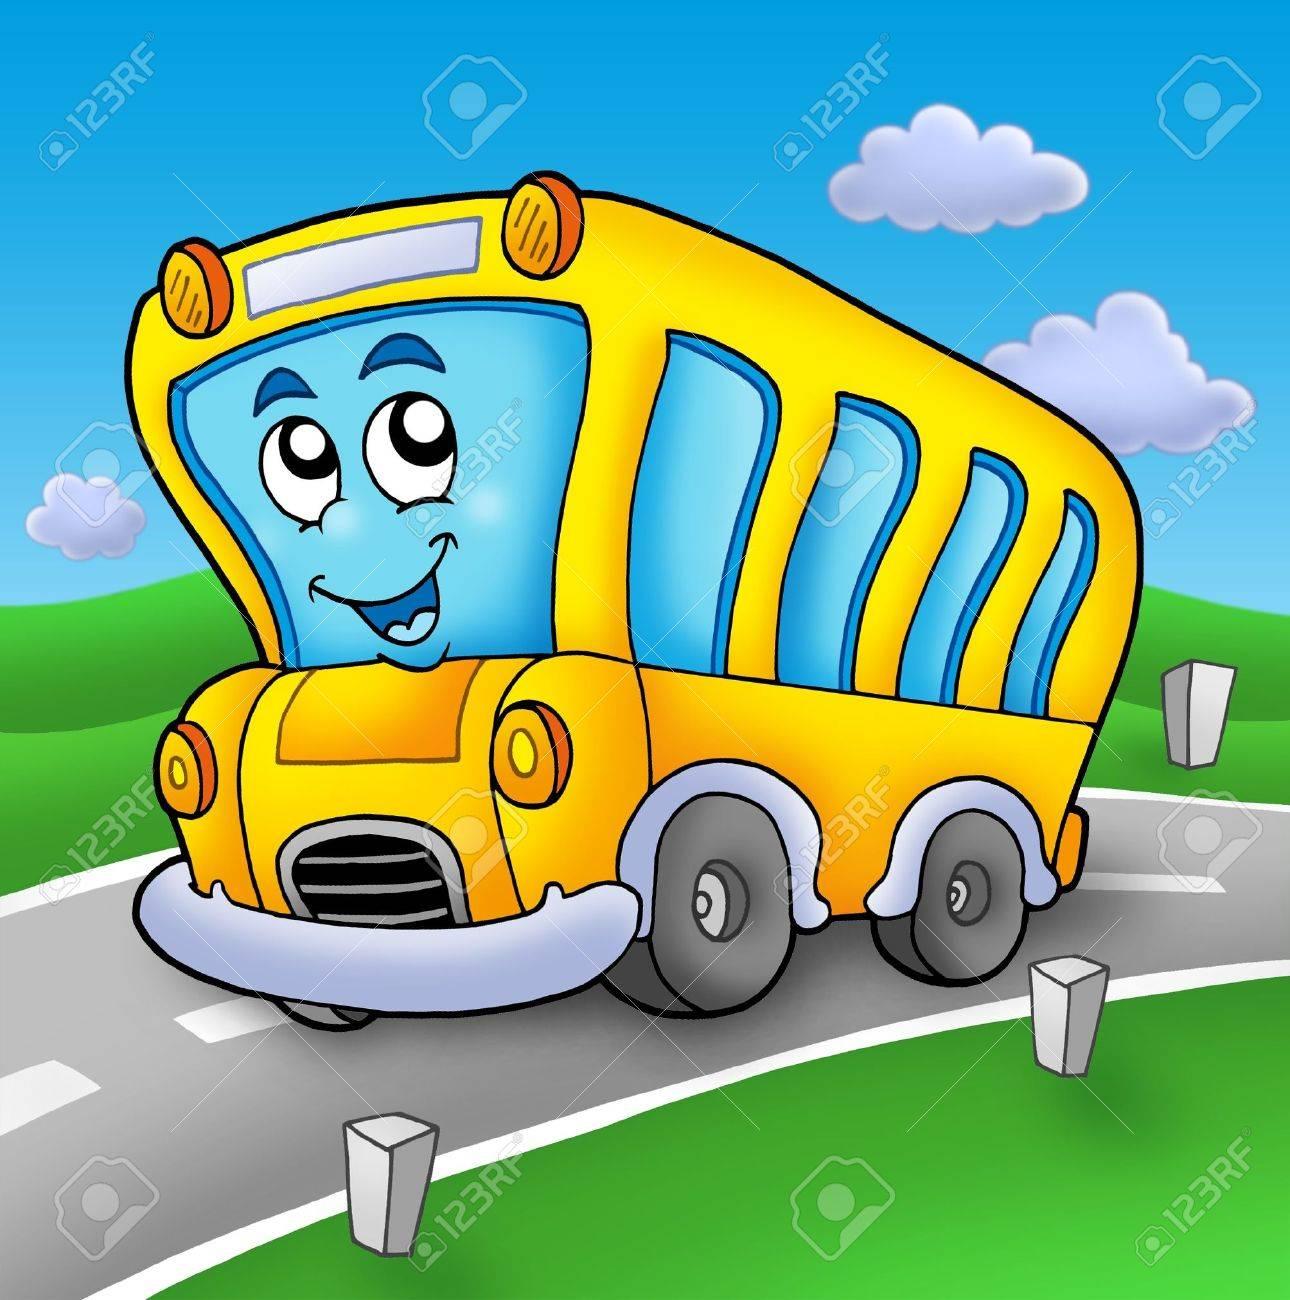 Yellow school bus on road - color illustration. Stock Illustration - 6232290